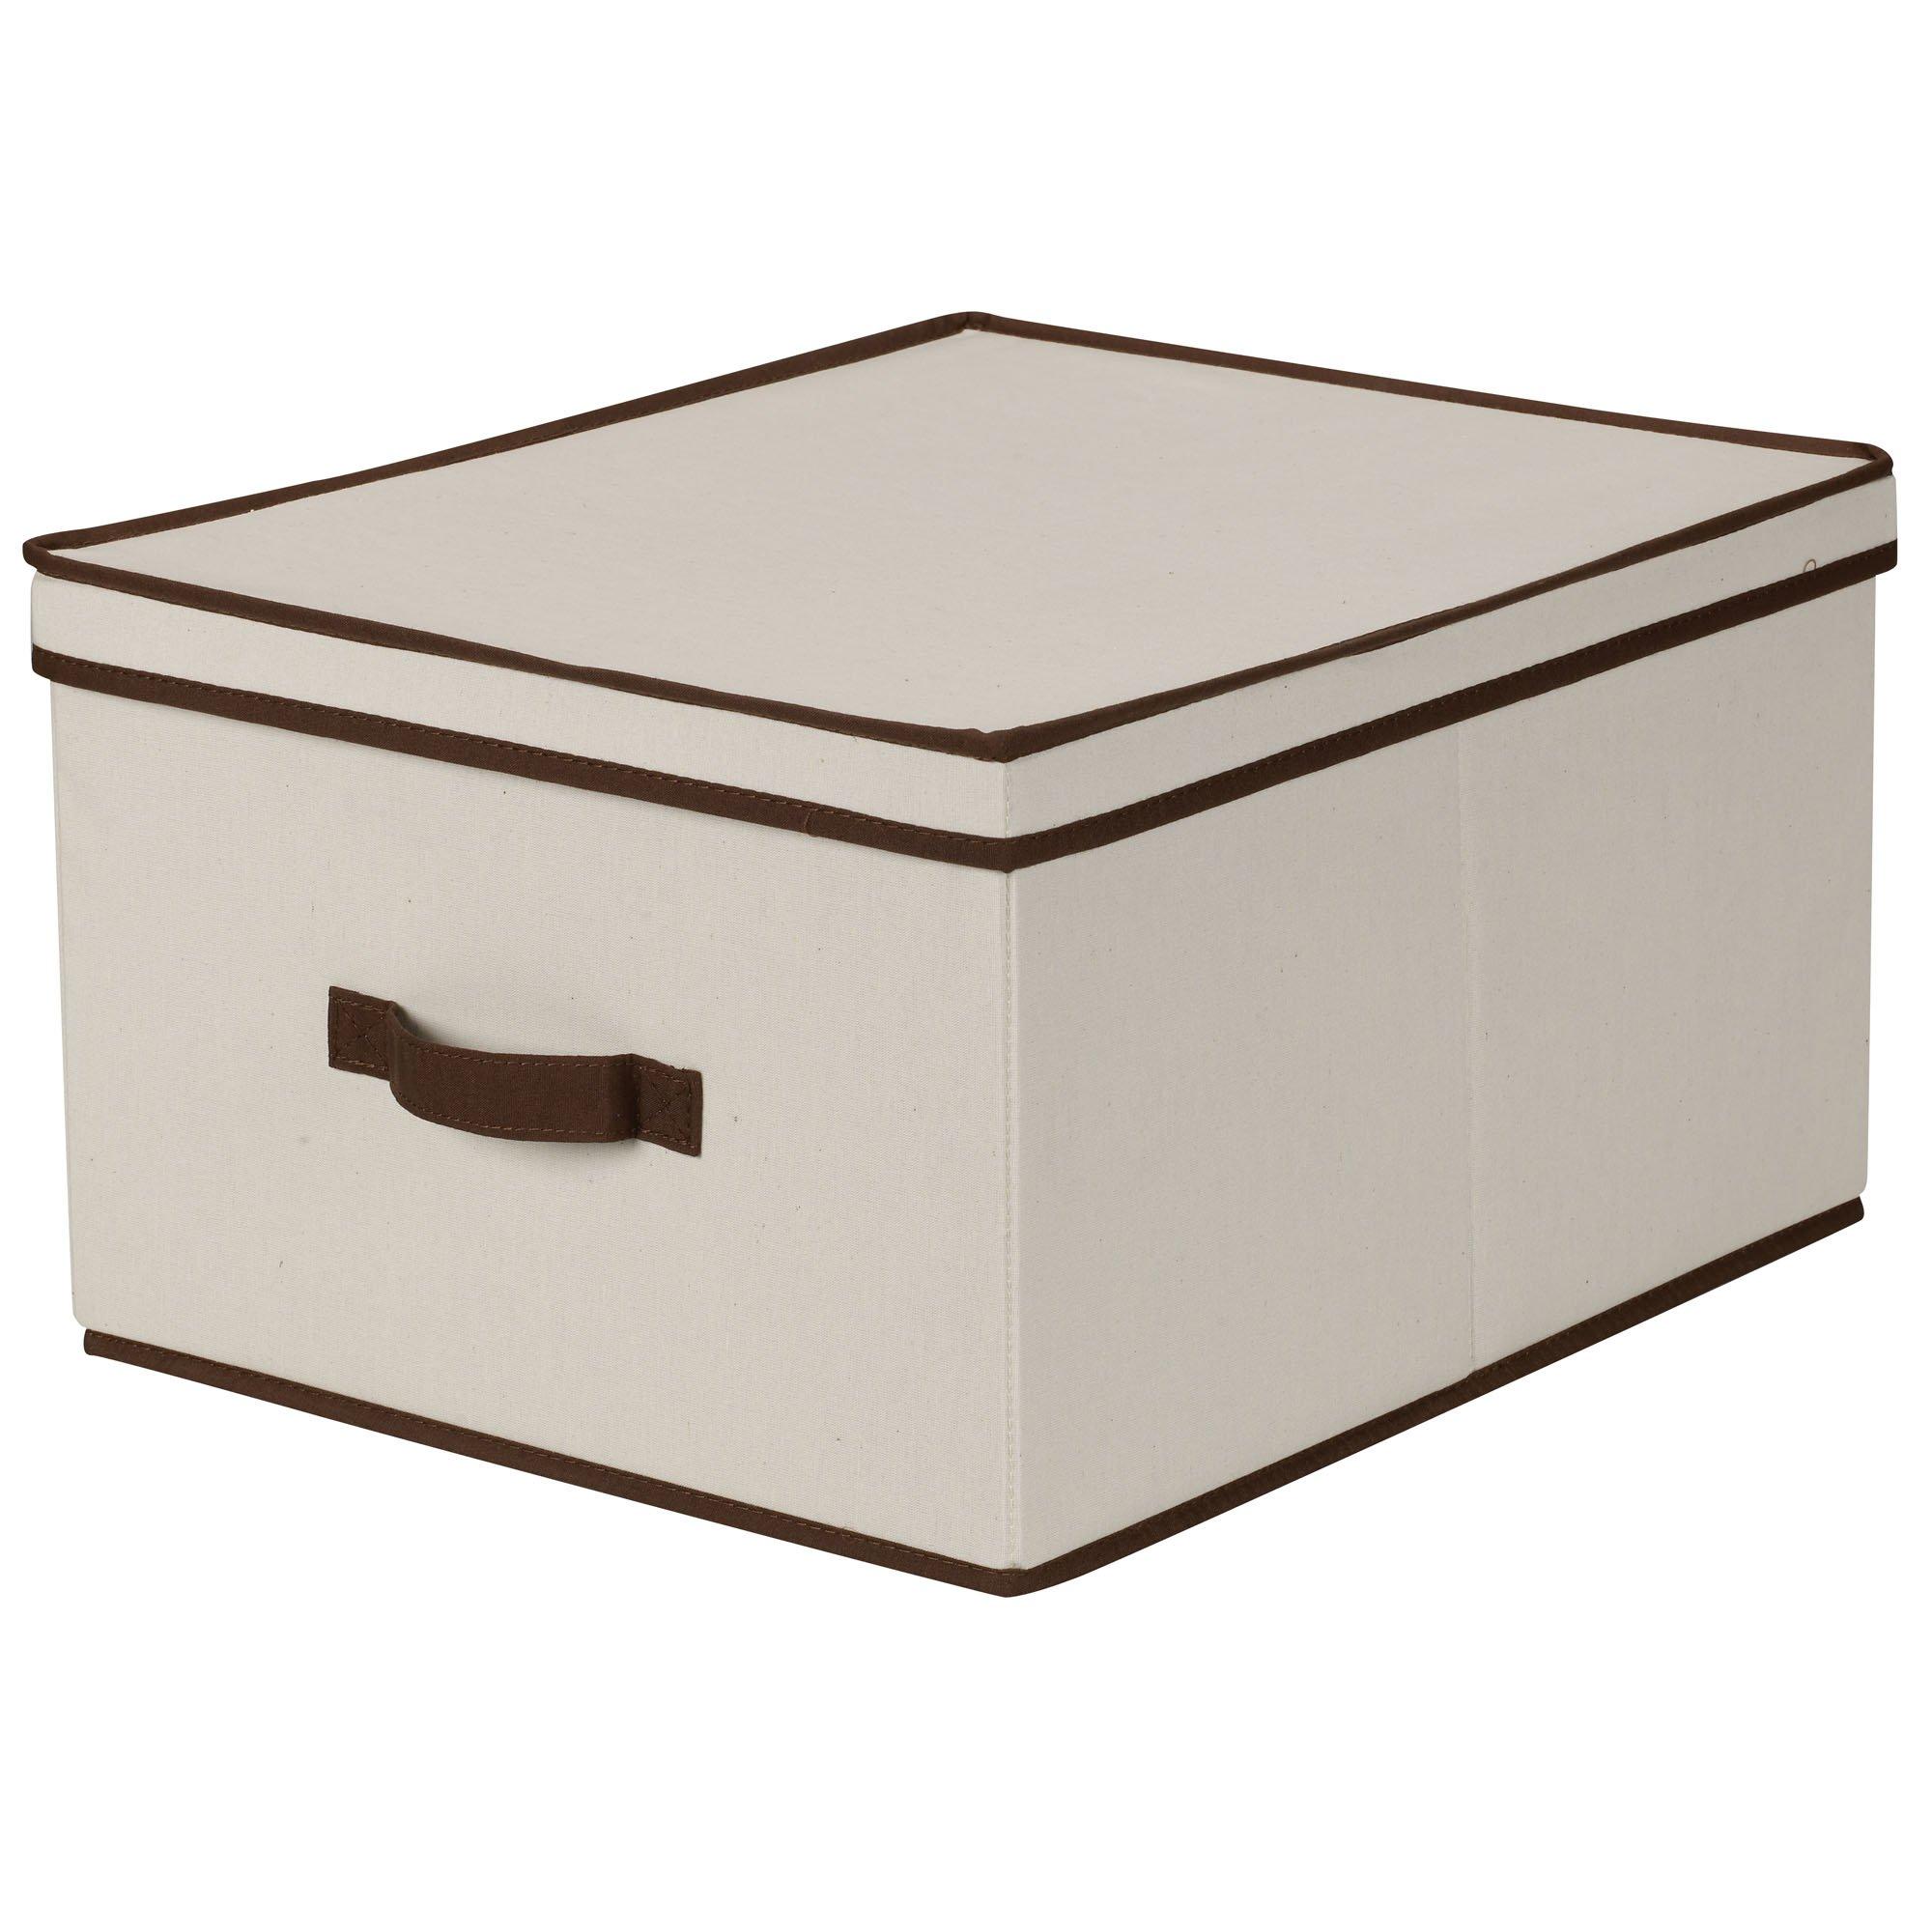 Household Essentials 515 Storage Box Lid Handle- Natural Beige Canvas Brown Trim- Jumbo